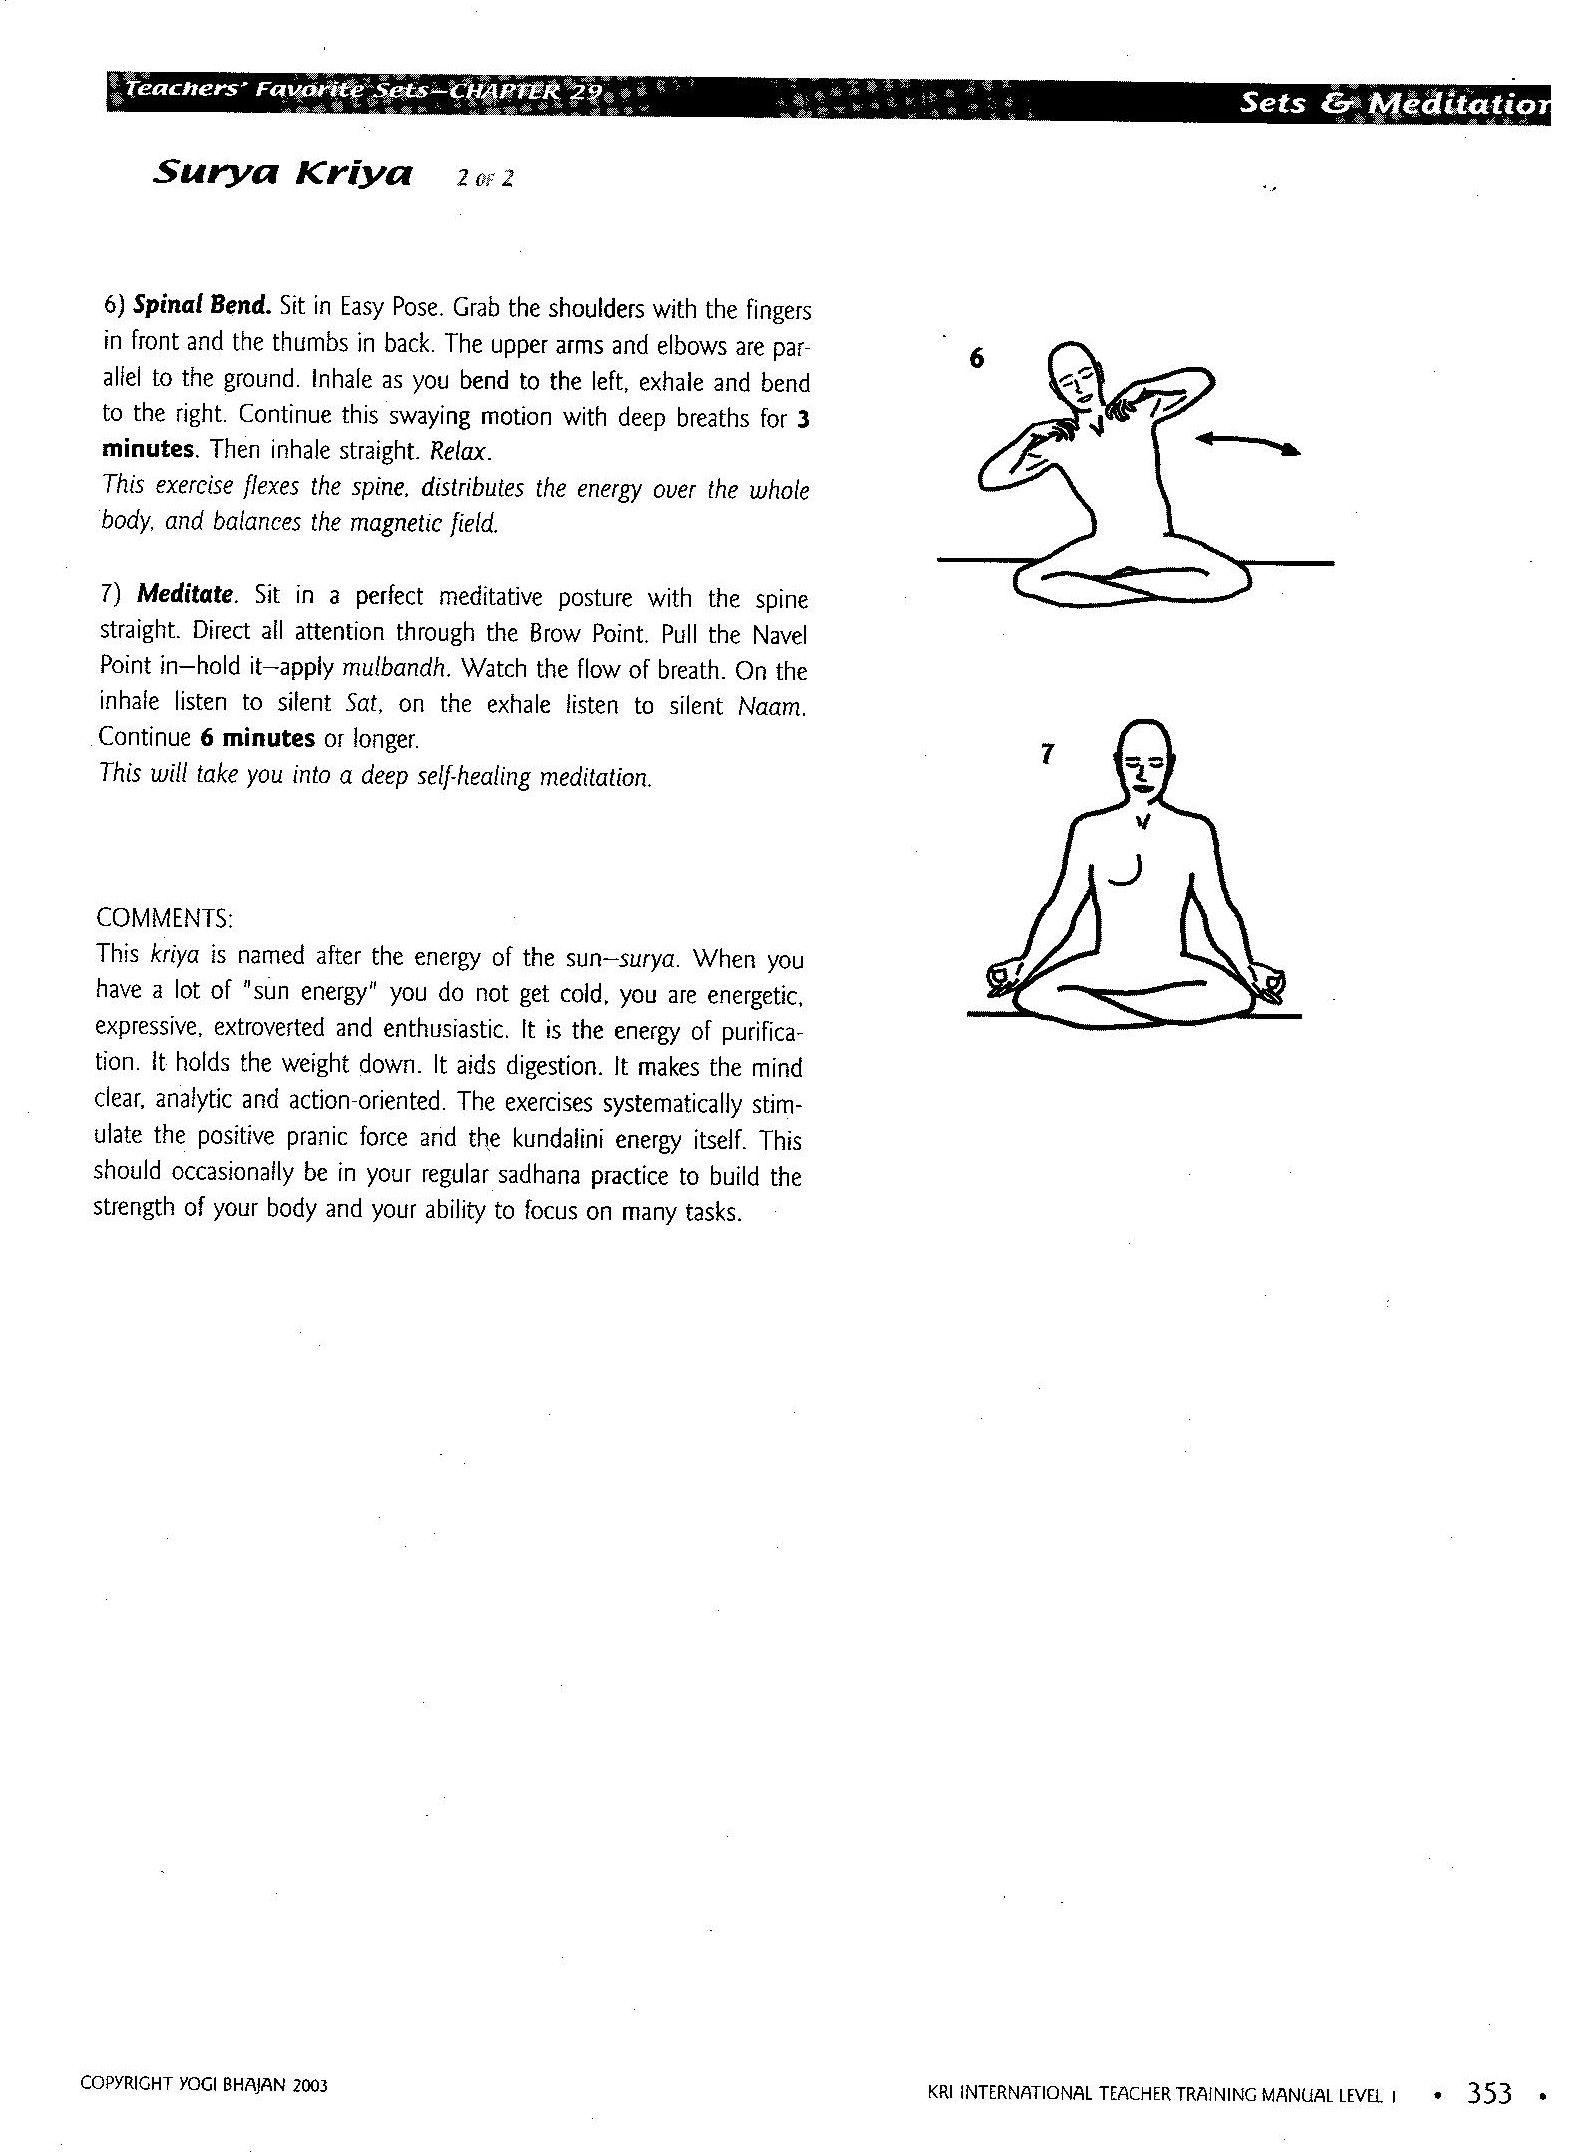 Surya Kriya Page 2 Kriya Kriya Yoga Kriya Yoga Meditation